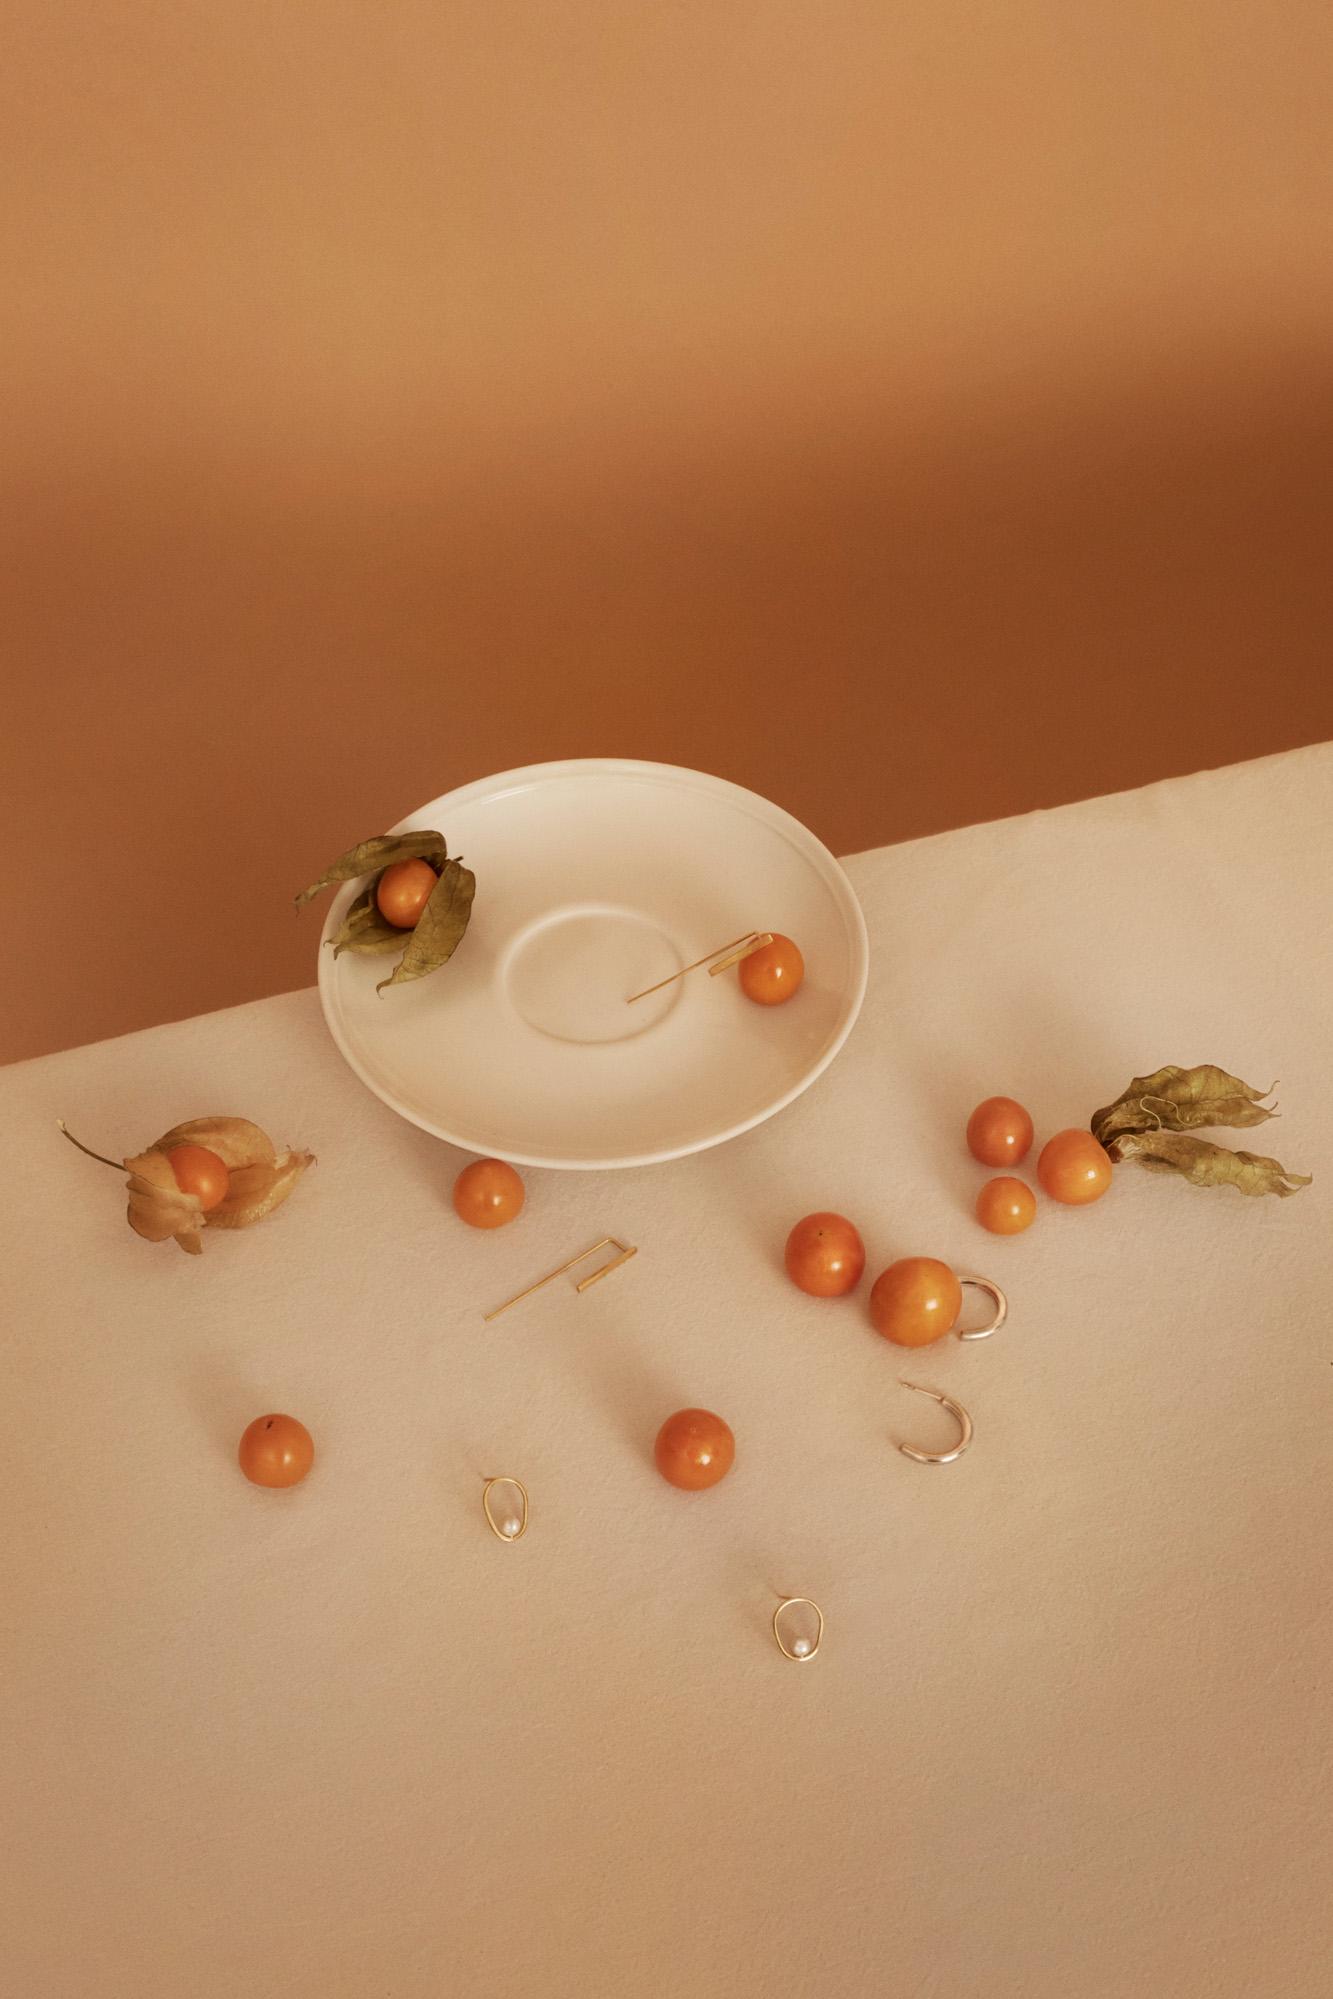 Orbit pearl earrings TAKK Gold earrings Candi Berlin Silver half hoop earrings Kiki Dieterle